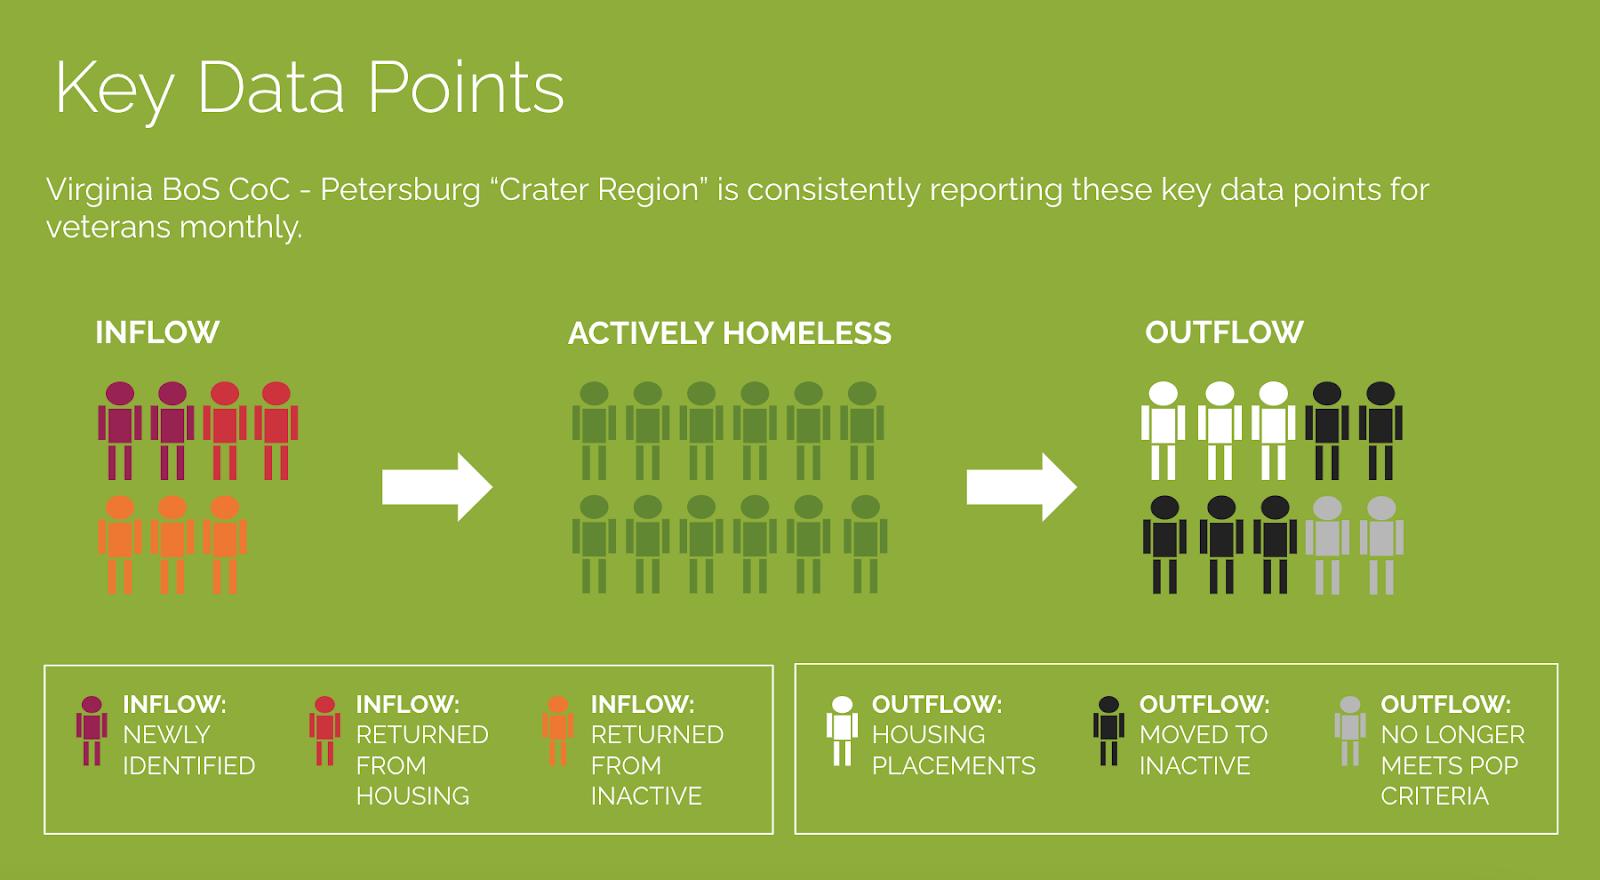 Key Data Points Graphic